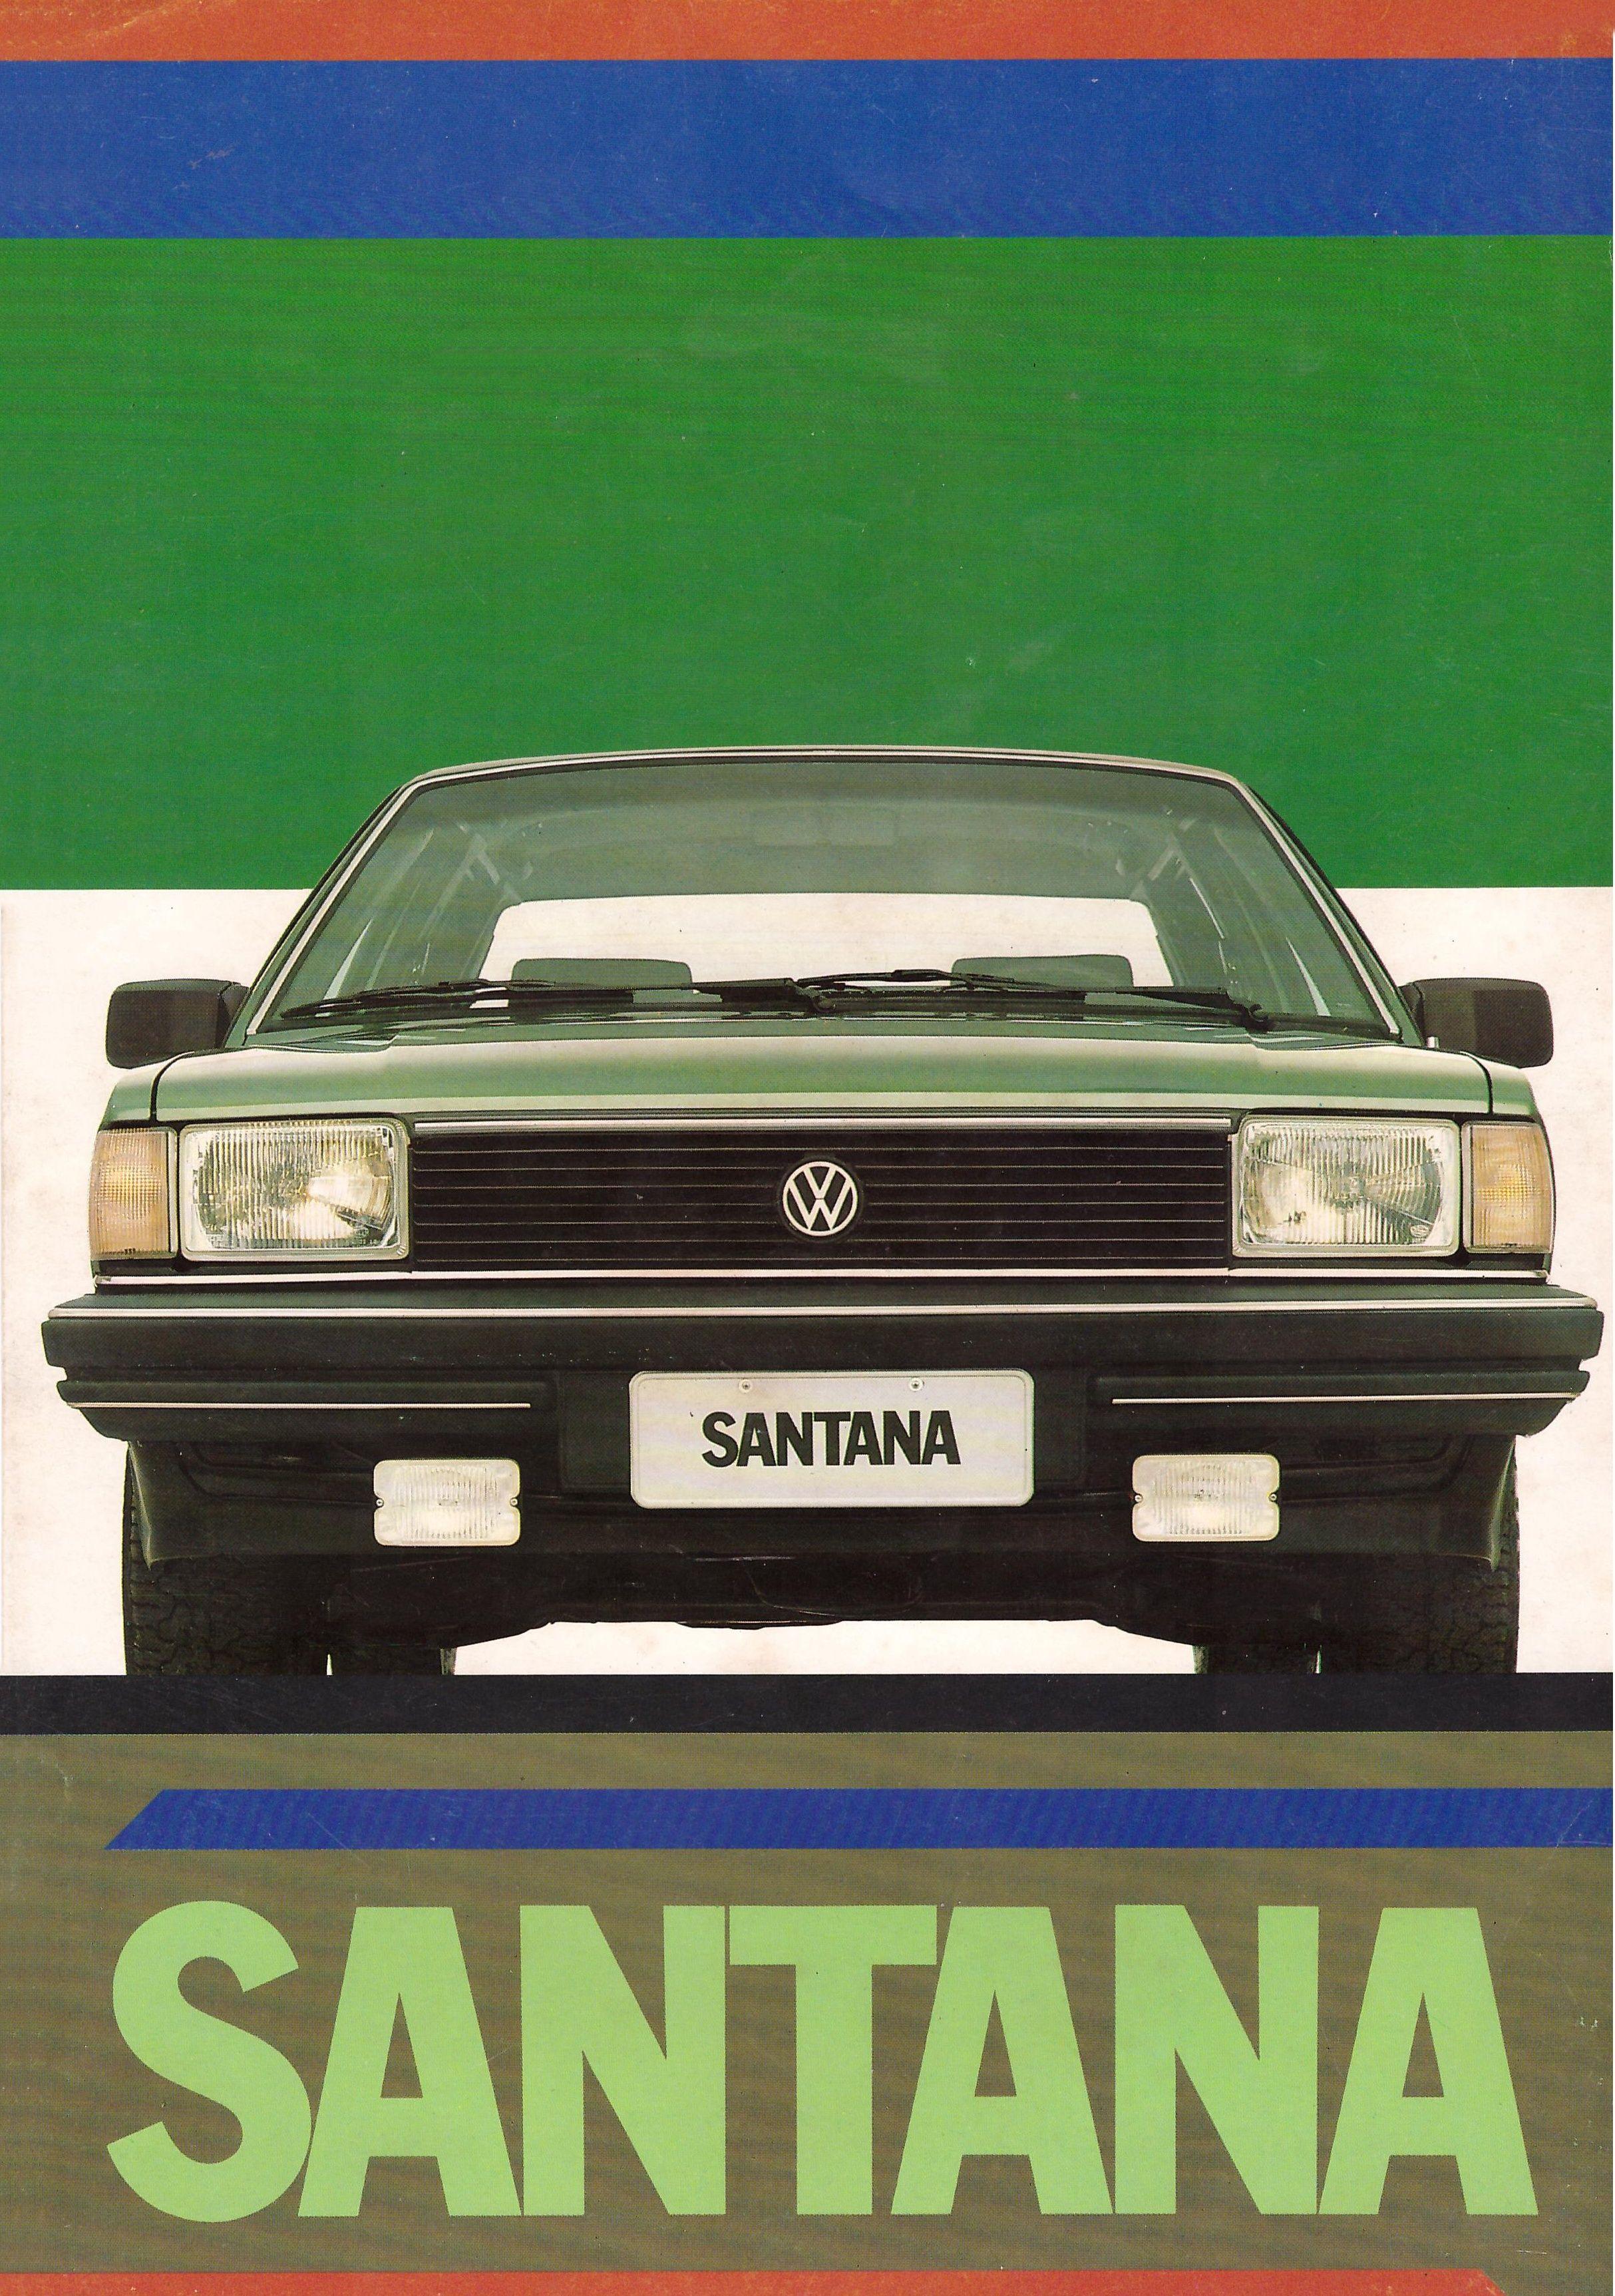 vw santana brochure